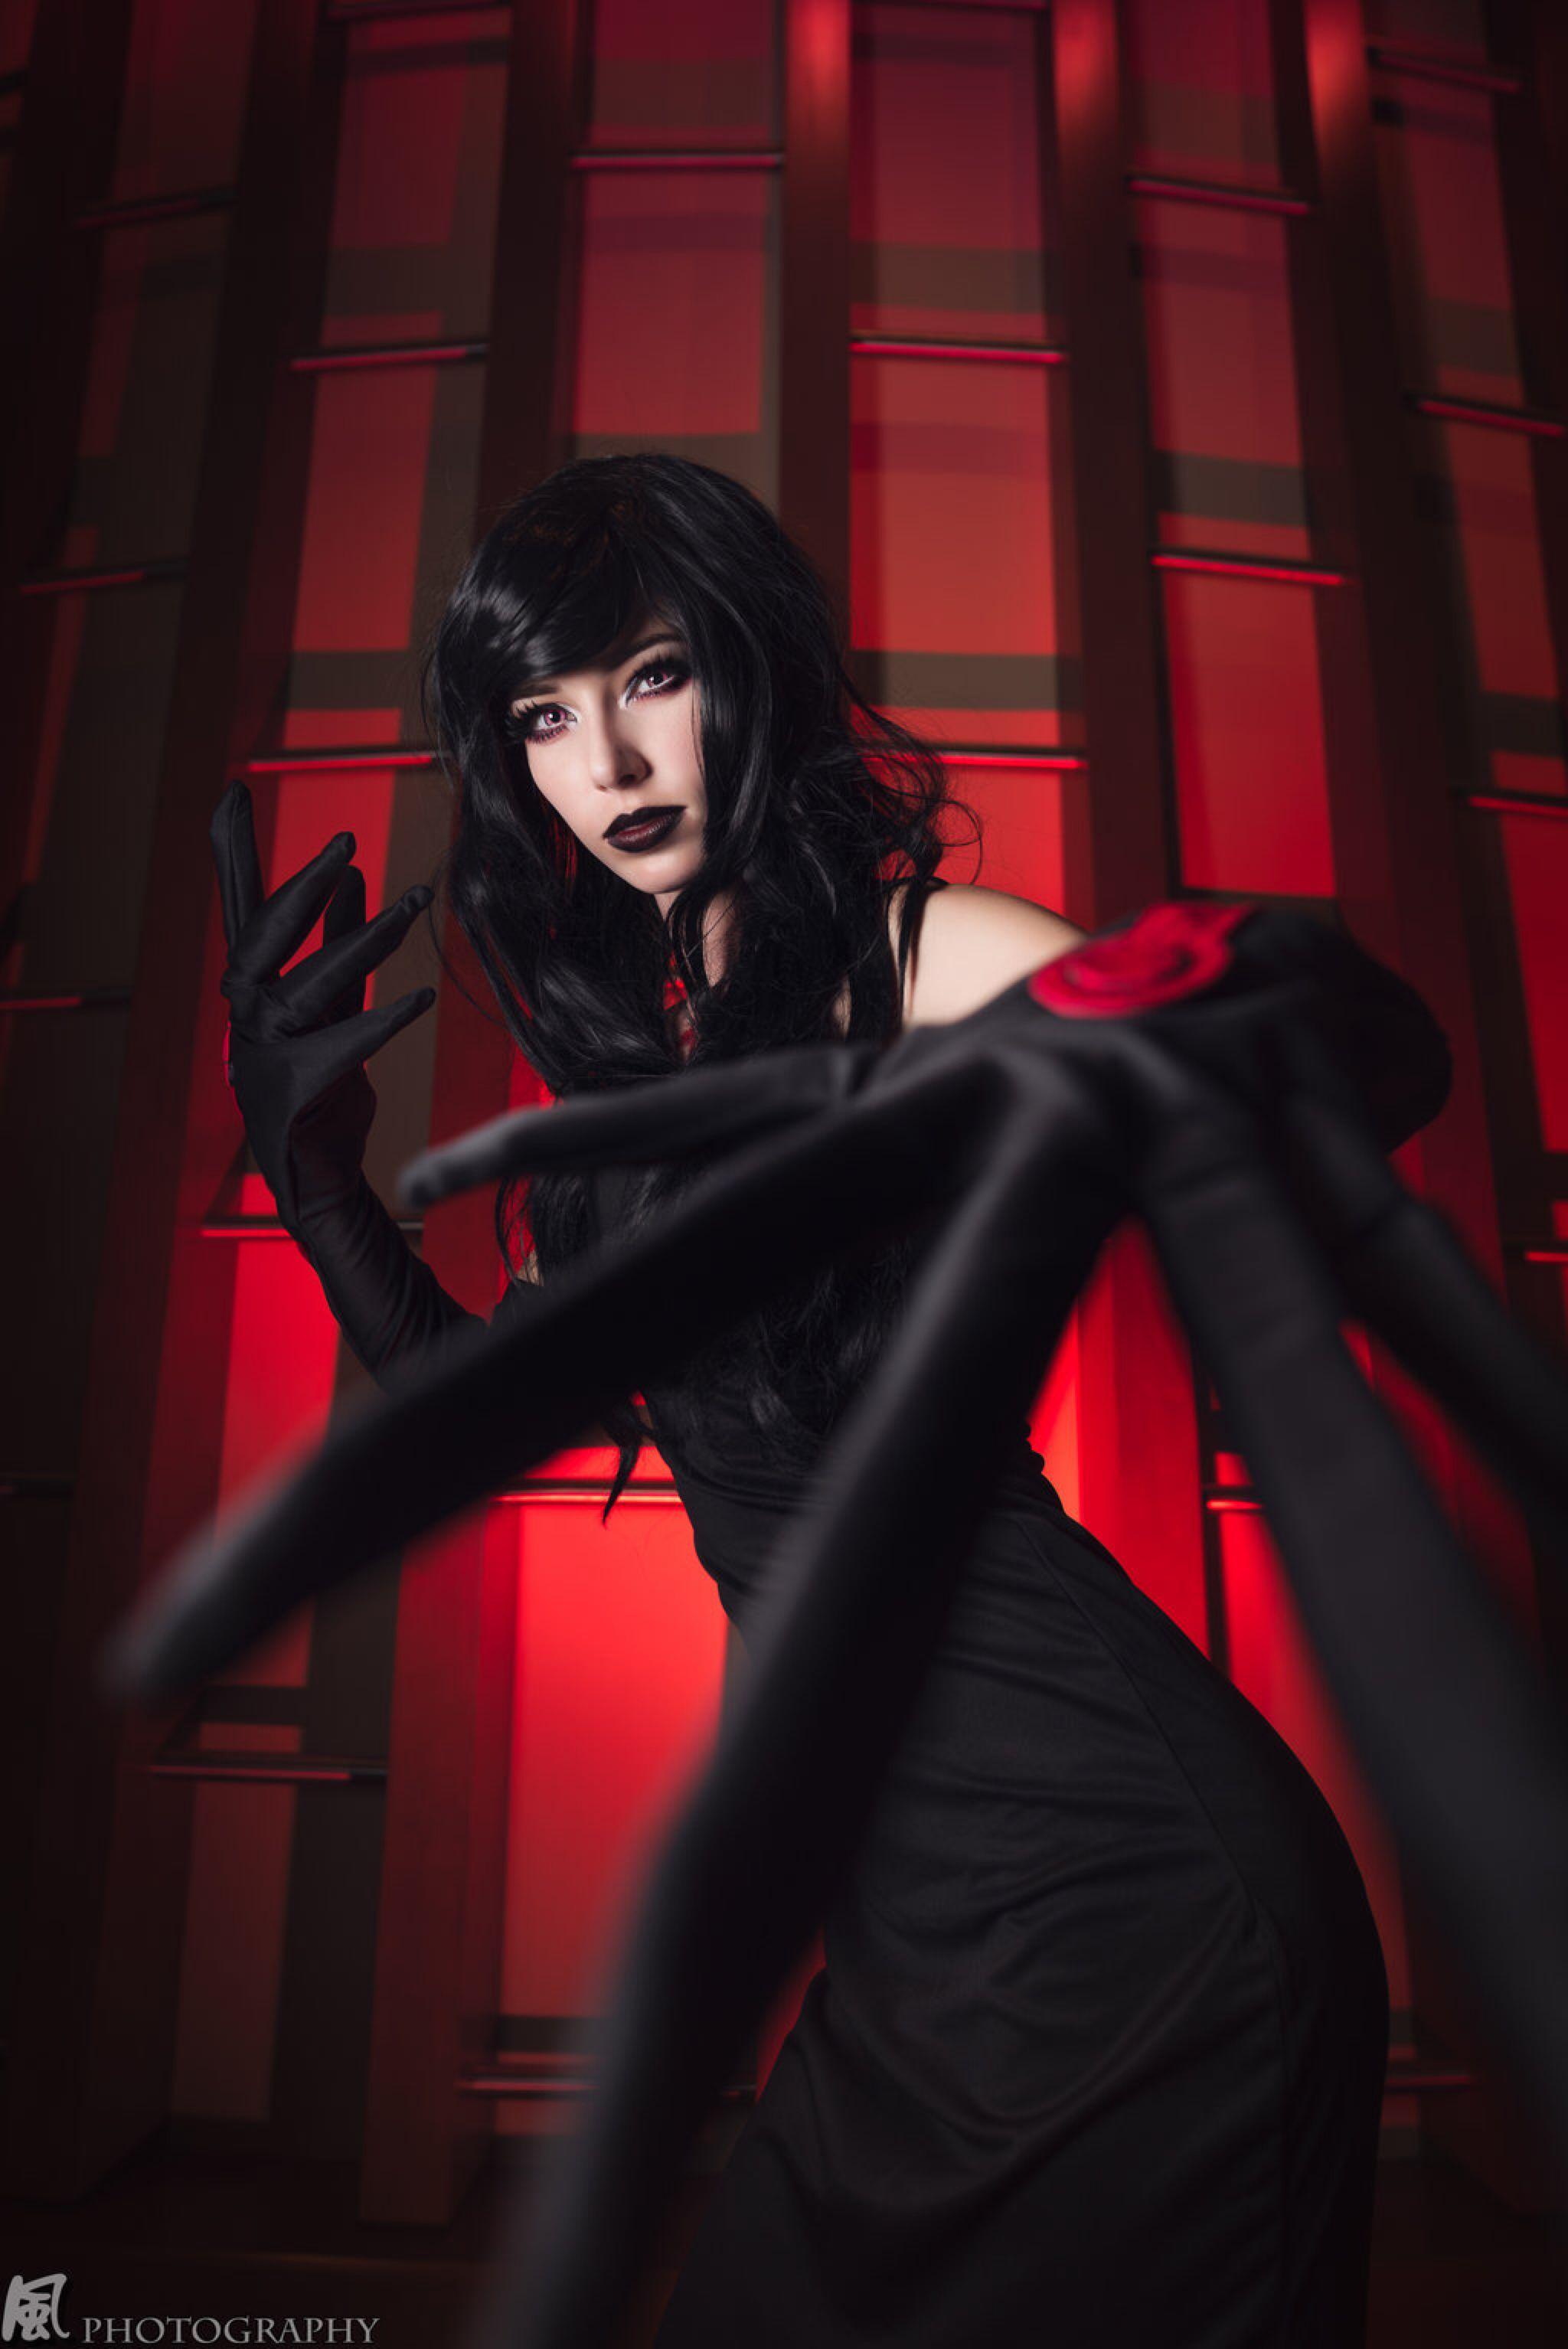 Lust - Attack by MeganCoffey on @DeviantArt